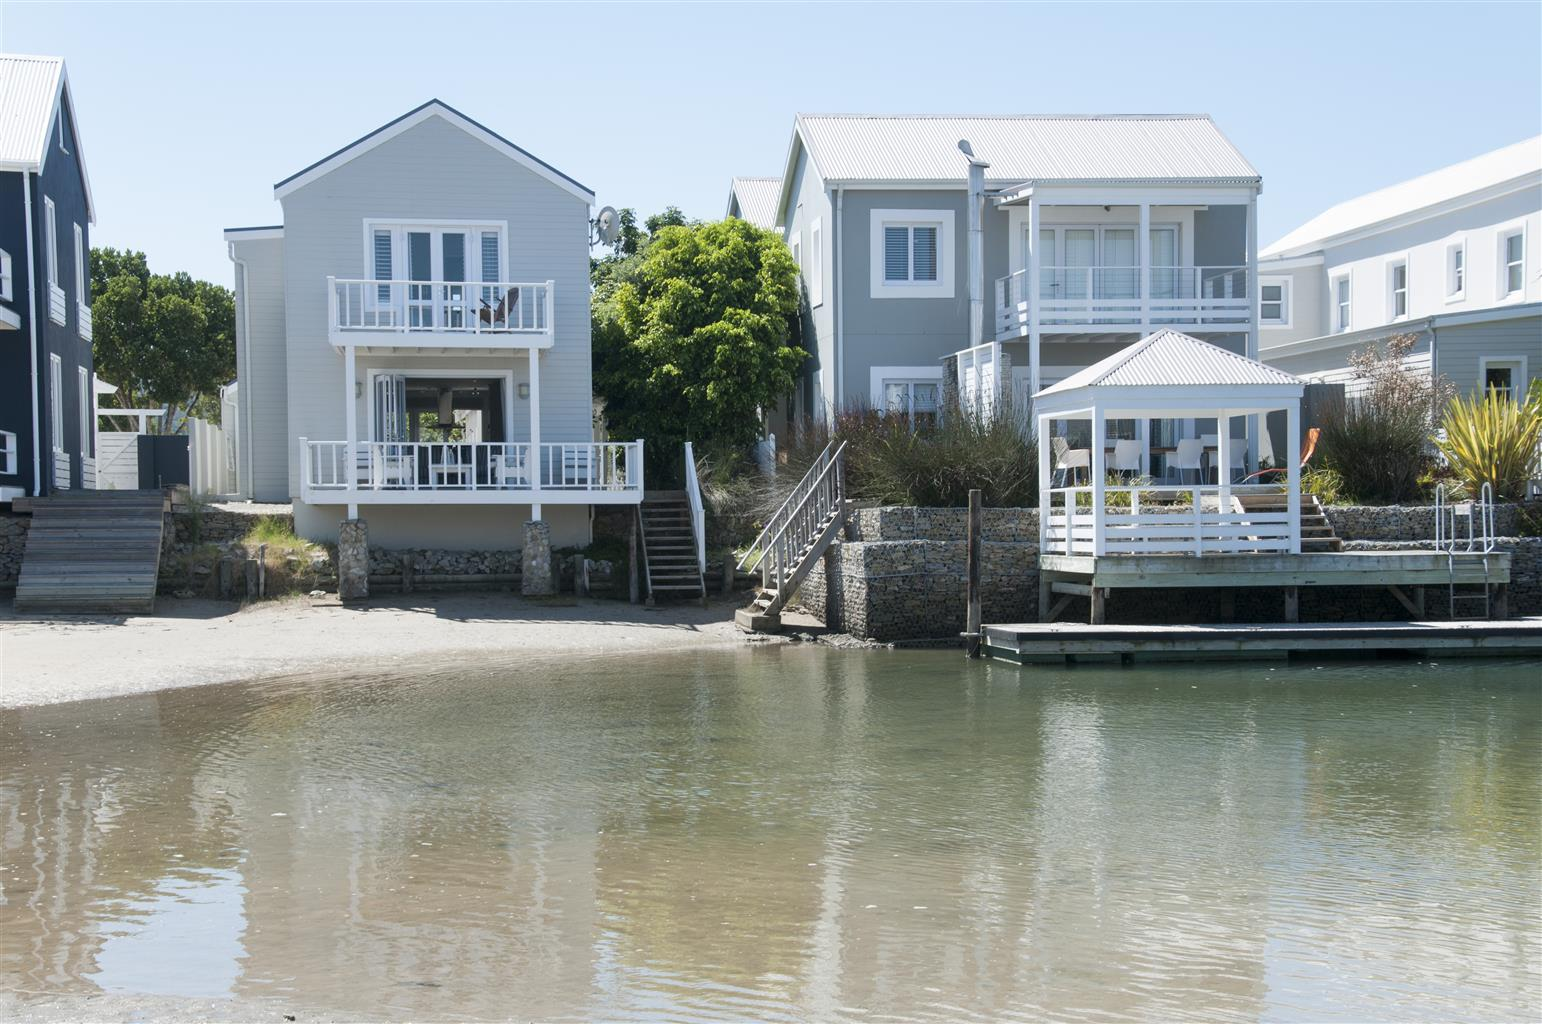 Thesen Island, Knysna, quaint two bedroom beach house